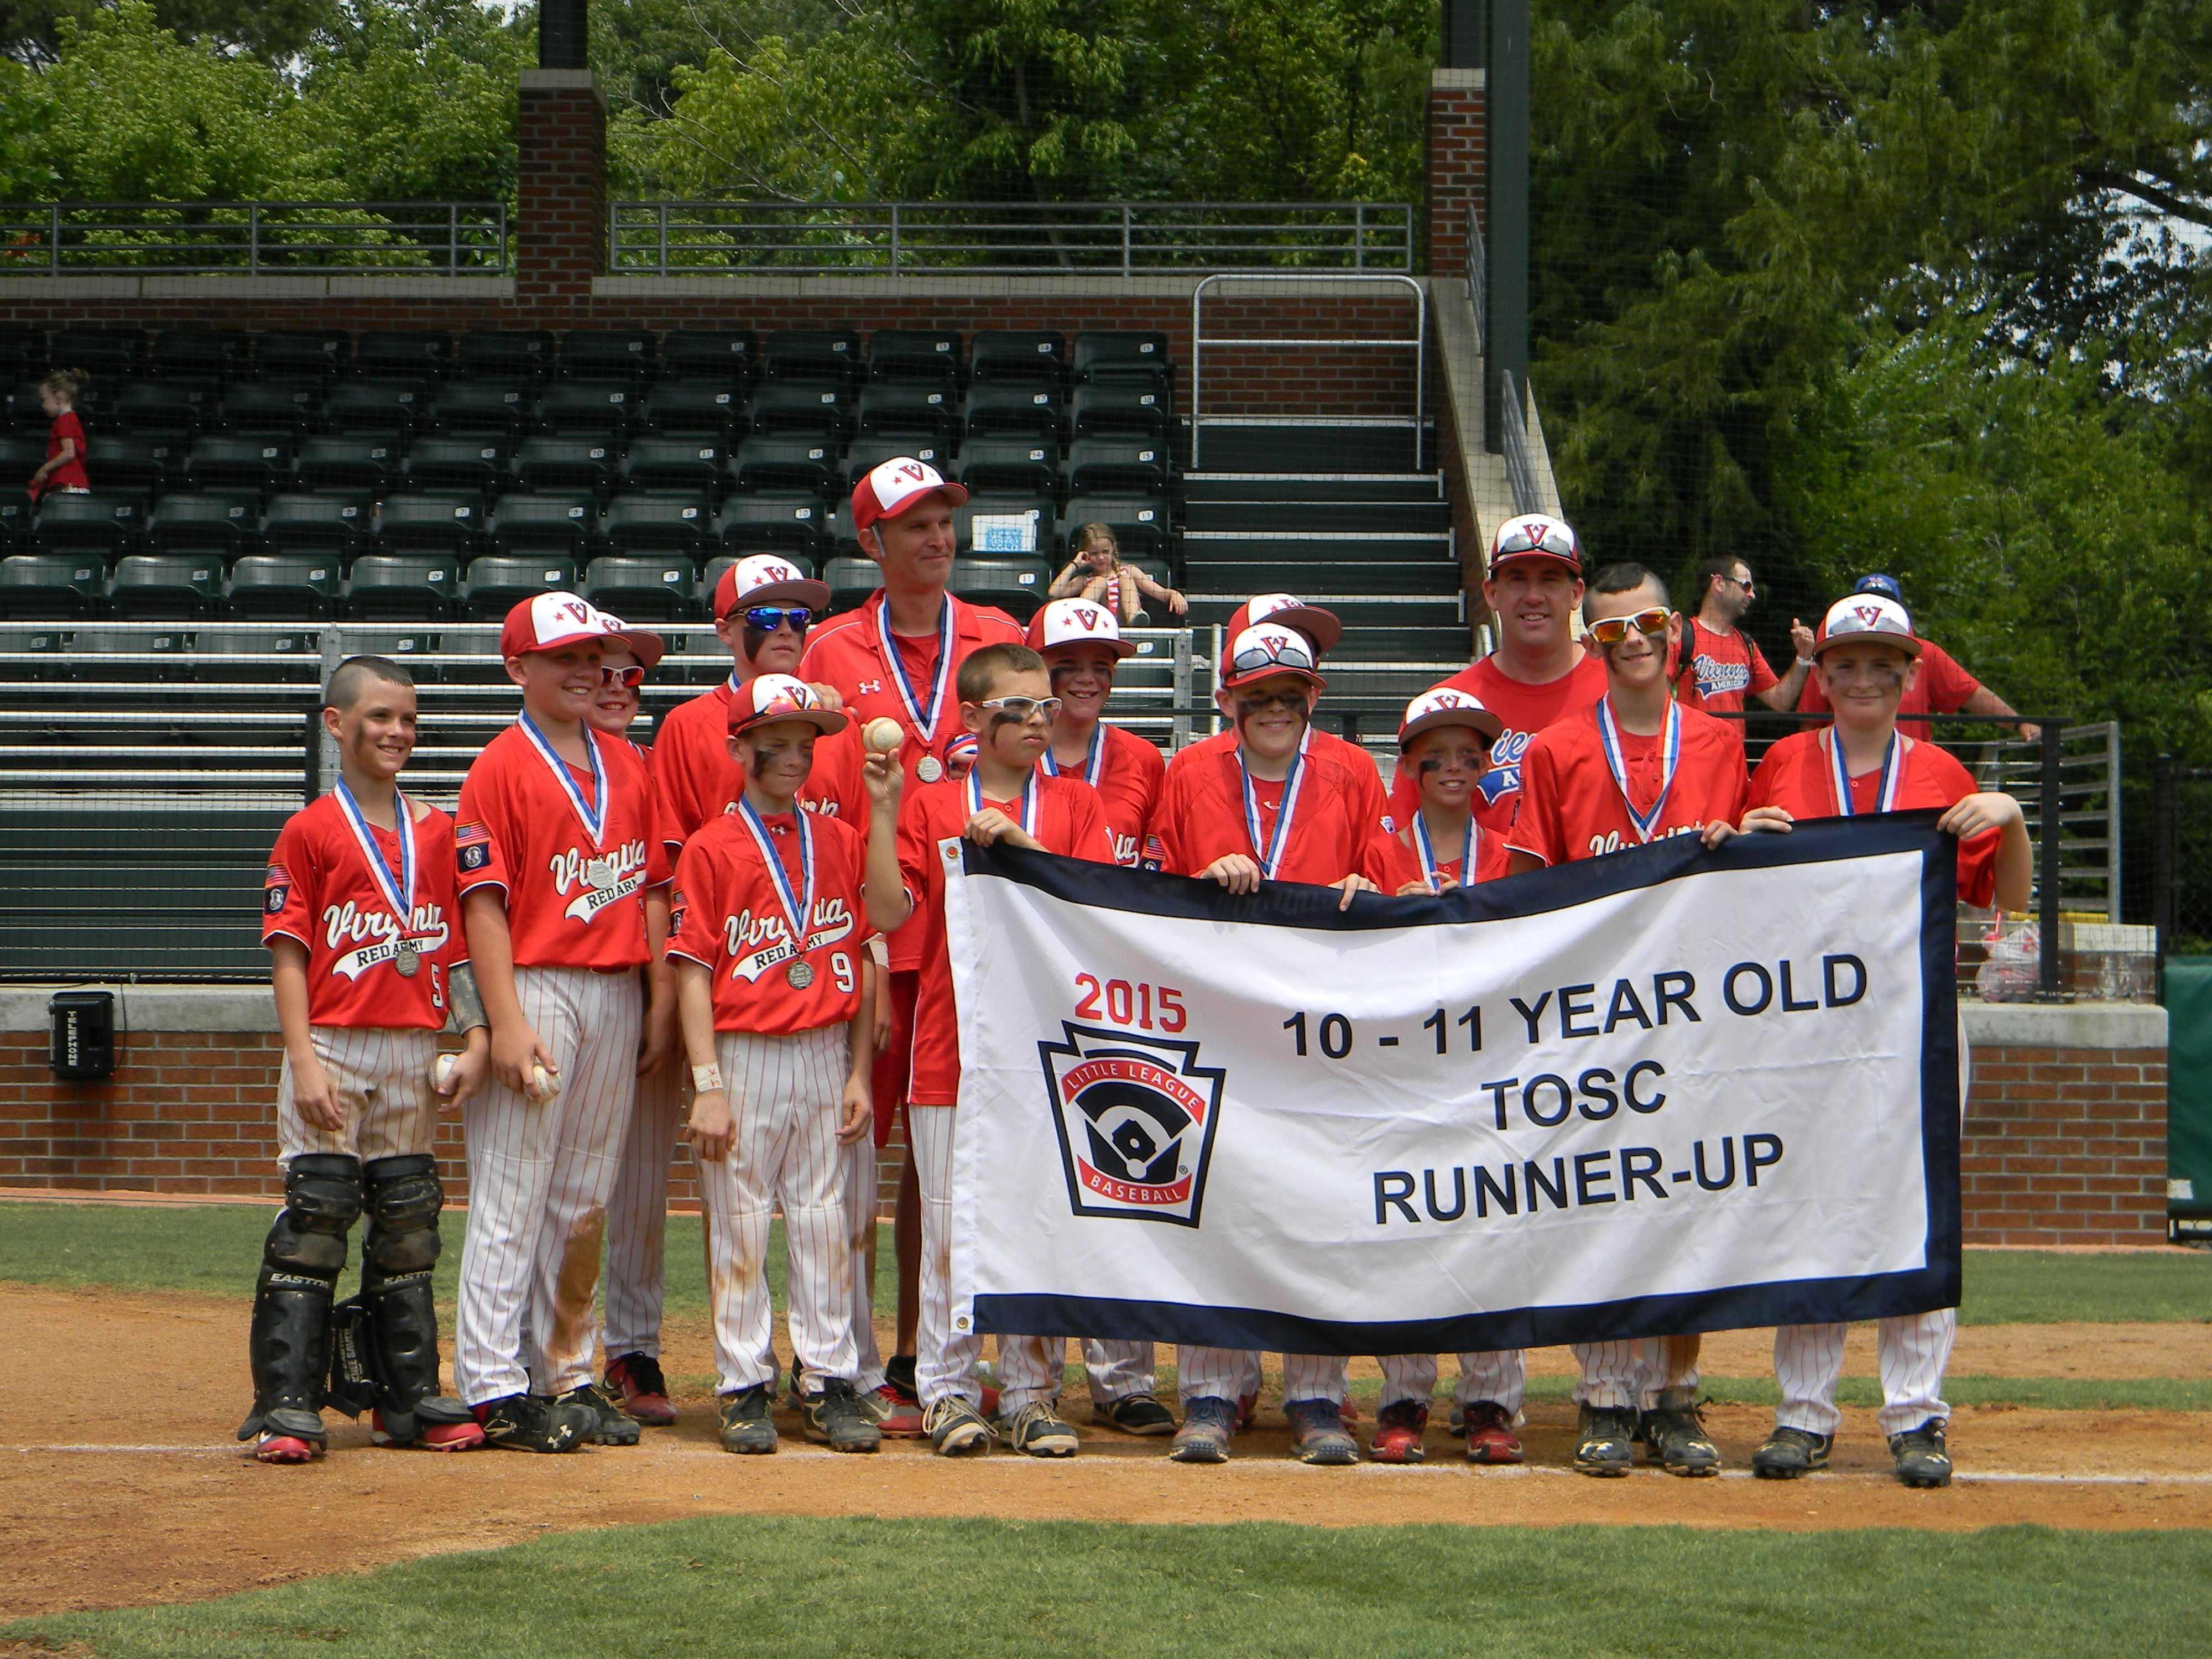 2015 TOSC 10-11 Runner-up